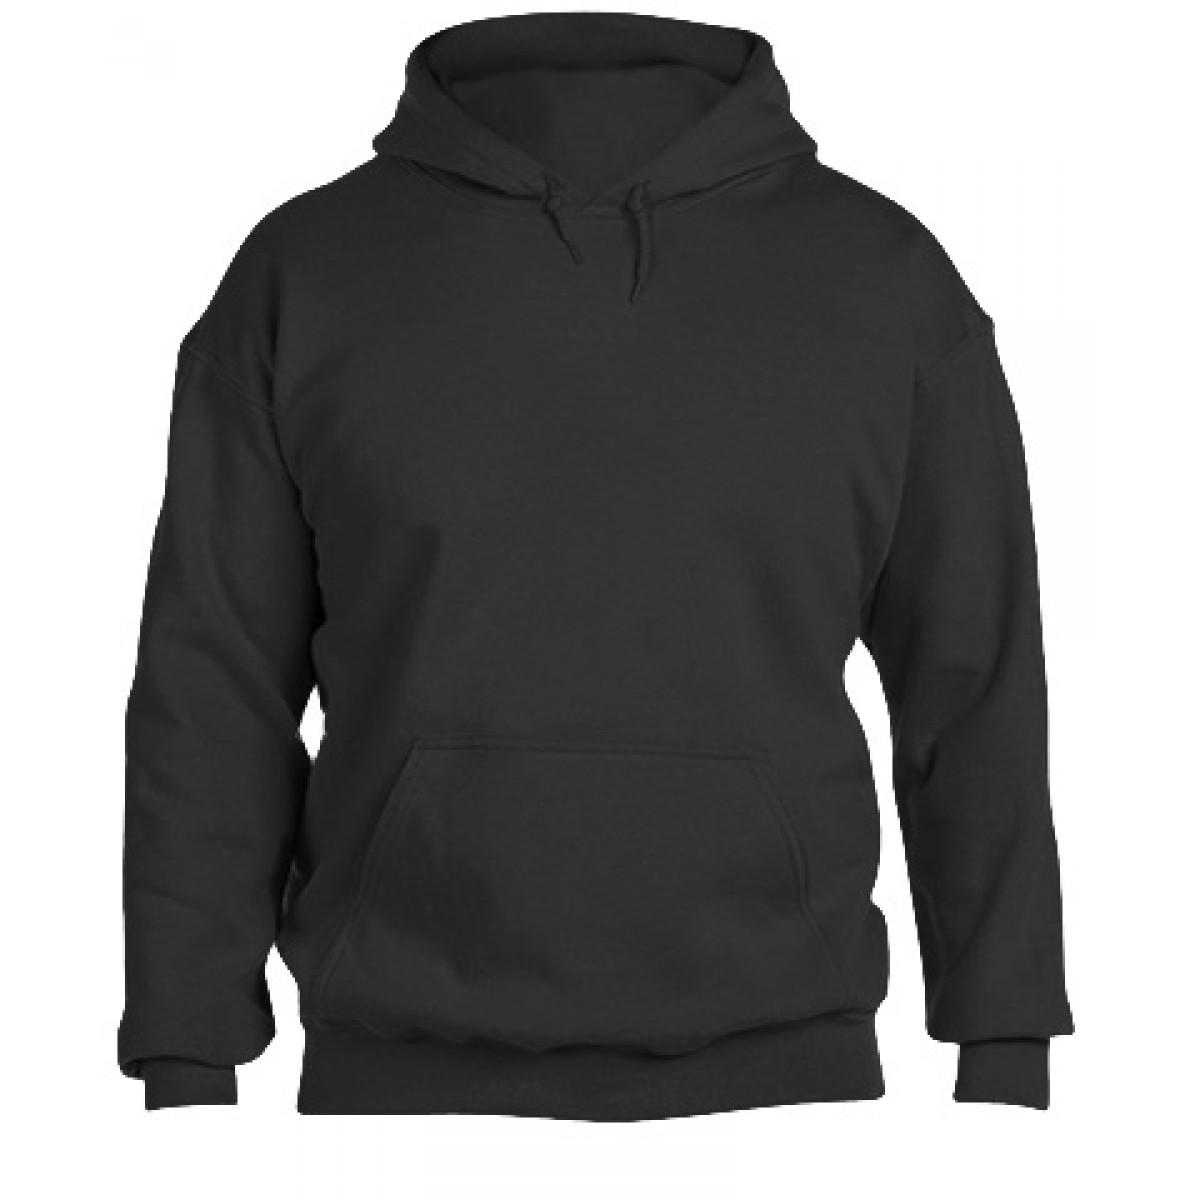 Hooded Sweatshirt 50/50 Heavy Blend -Black-L